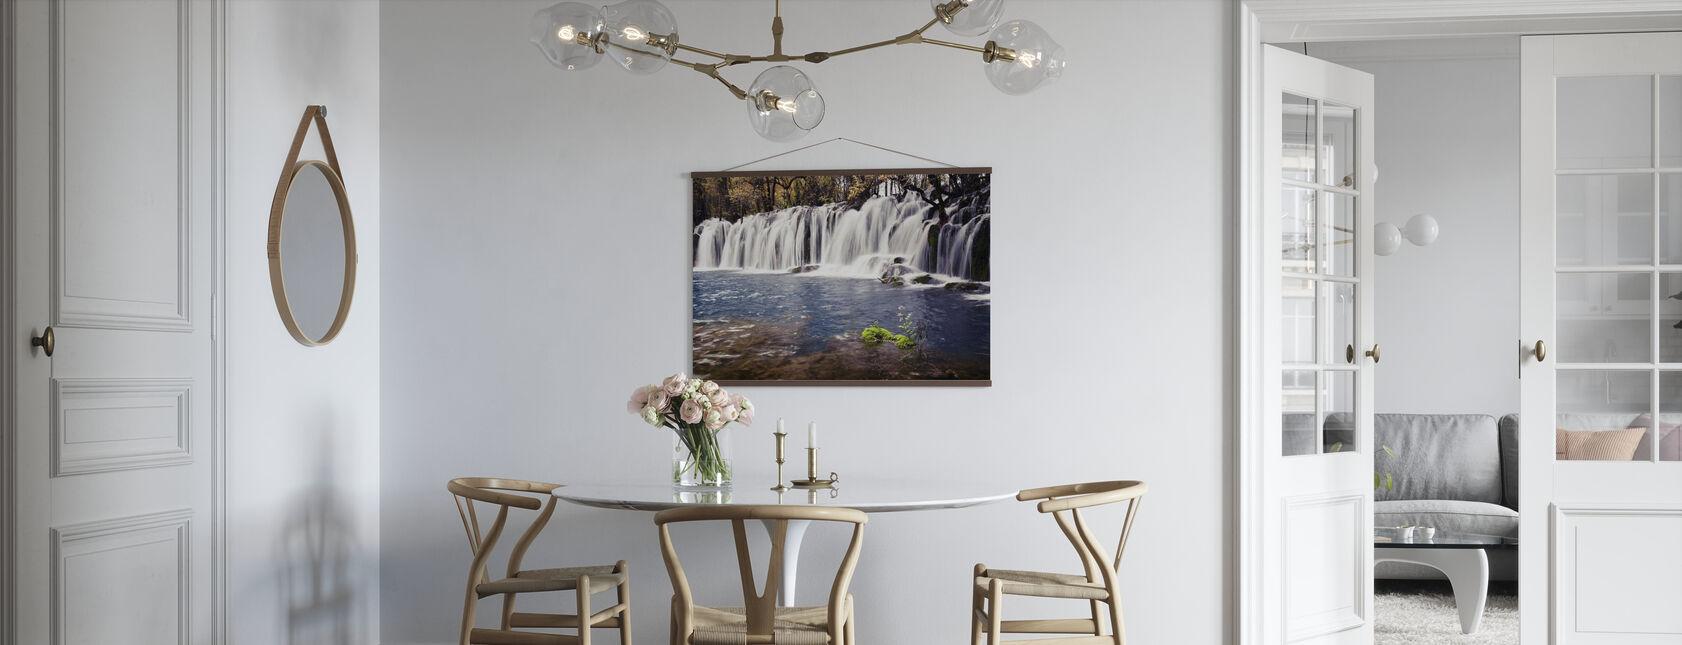 Water Afflux - Poster - Kitchen